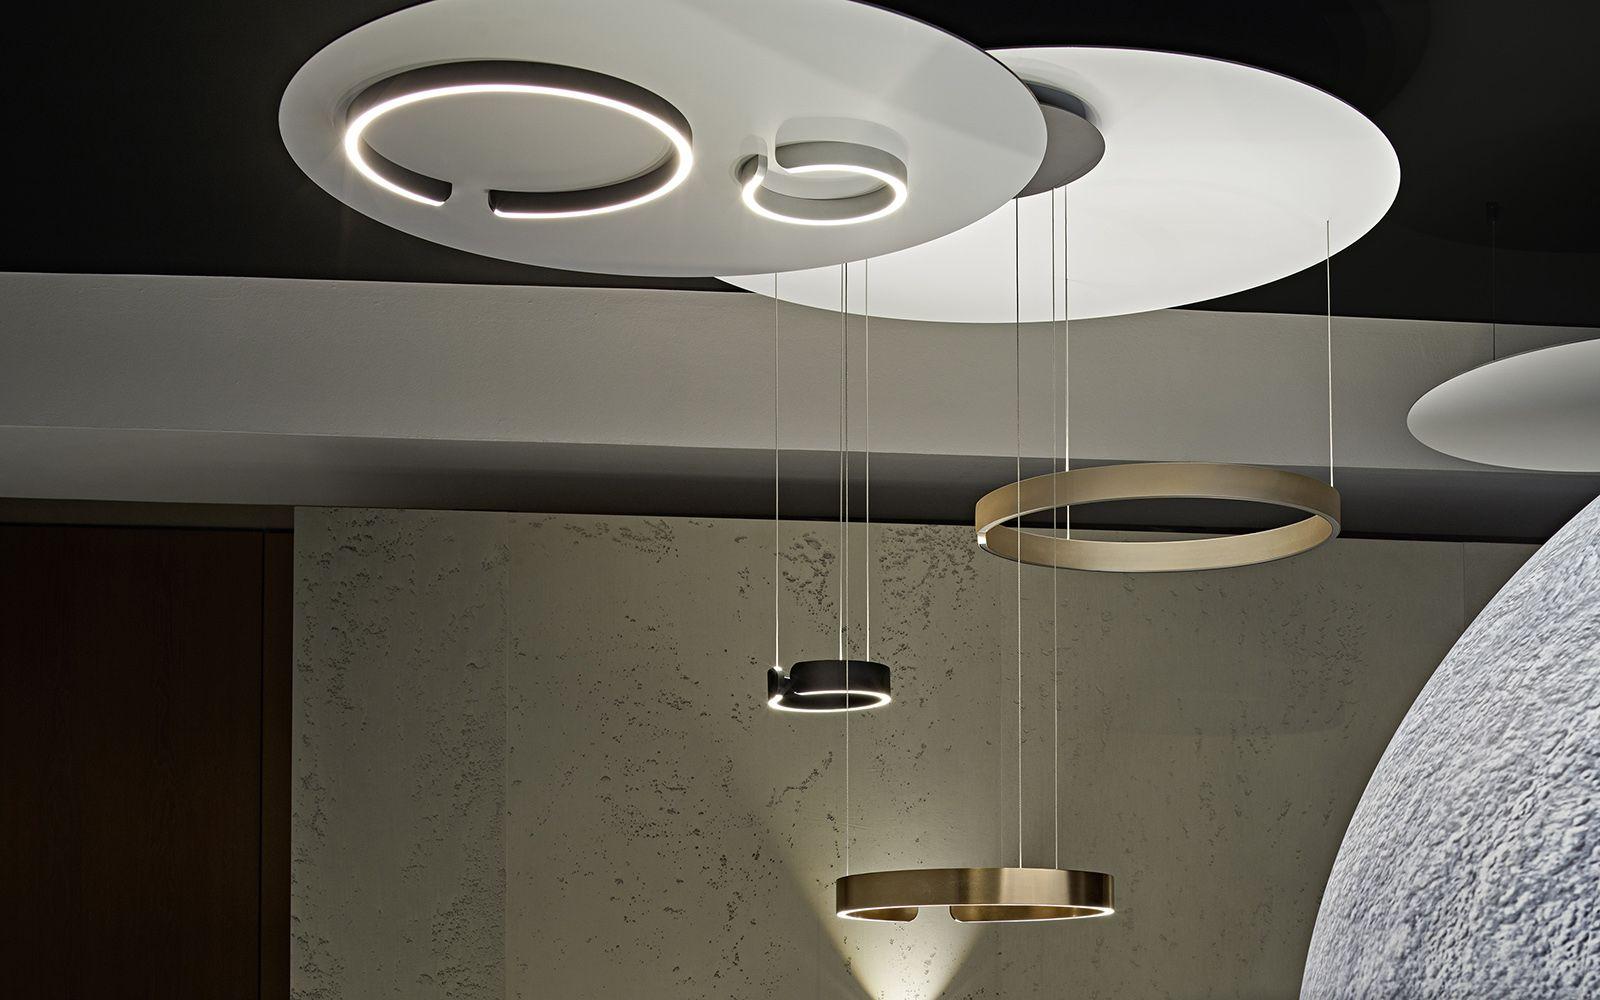 mito occhio laluce licht design chur occhio lights. Black Bedroom Furniture Sets. Home Design Ideas